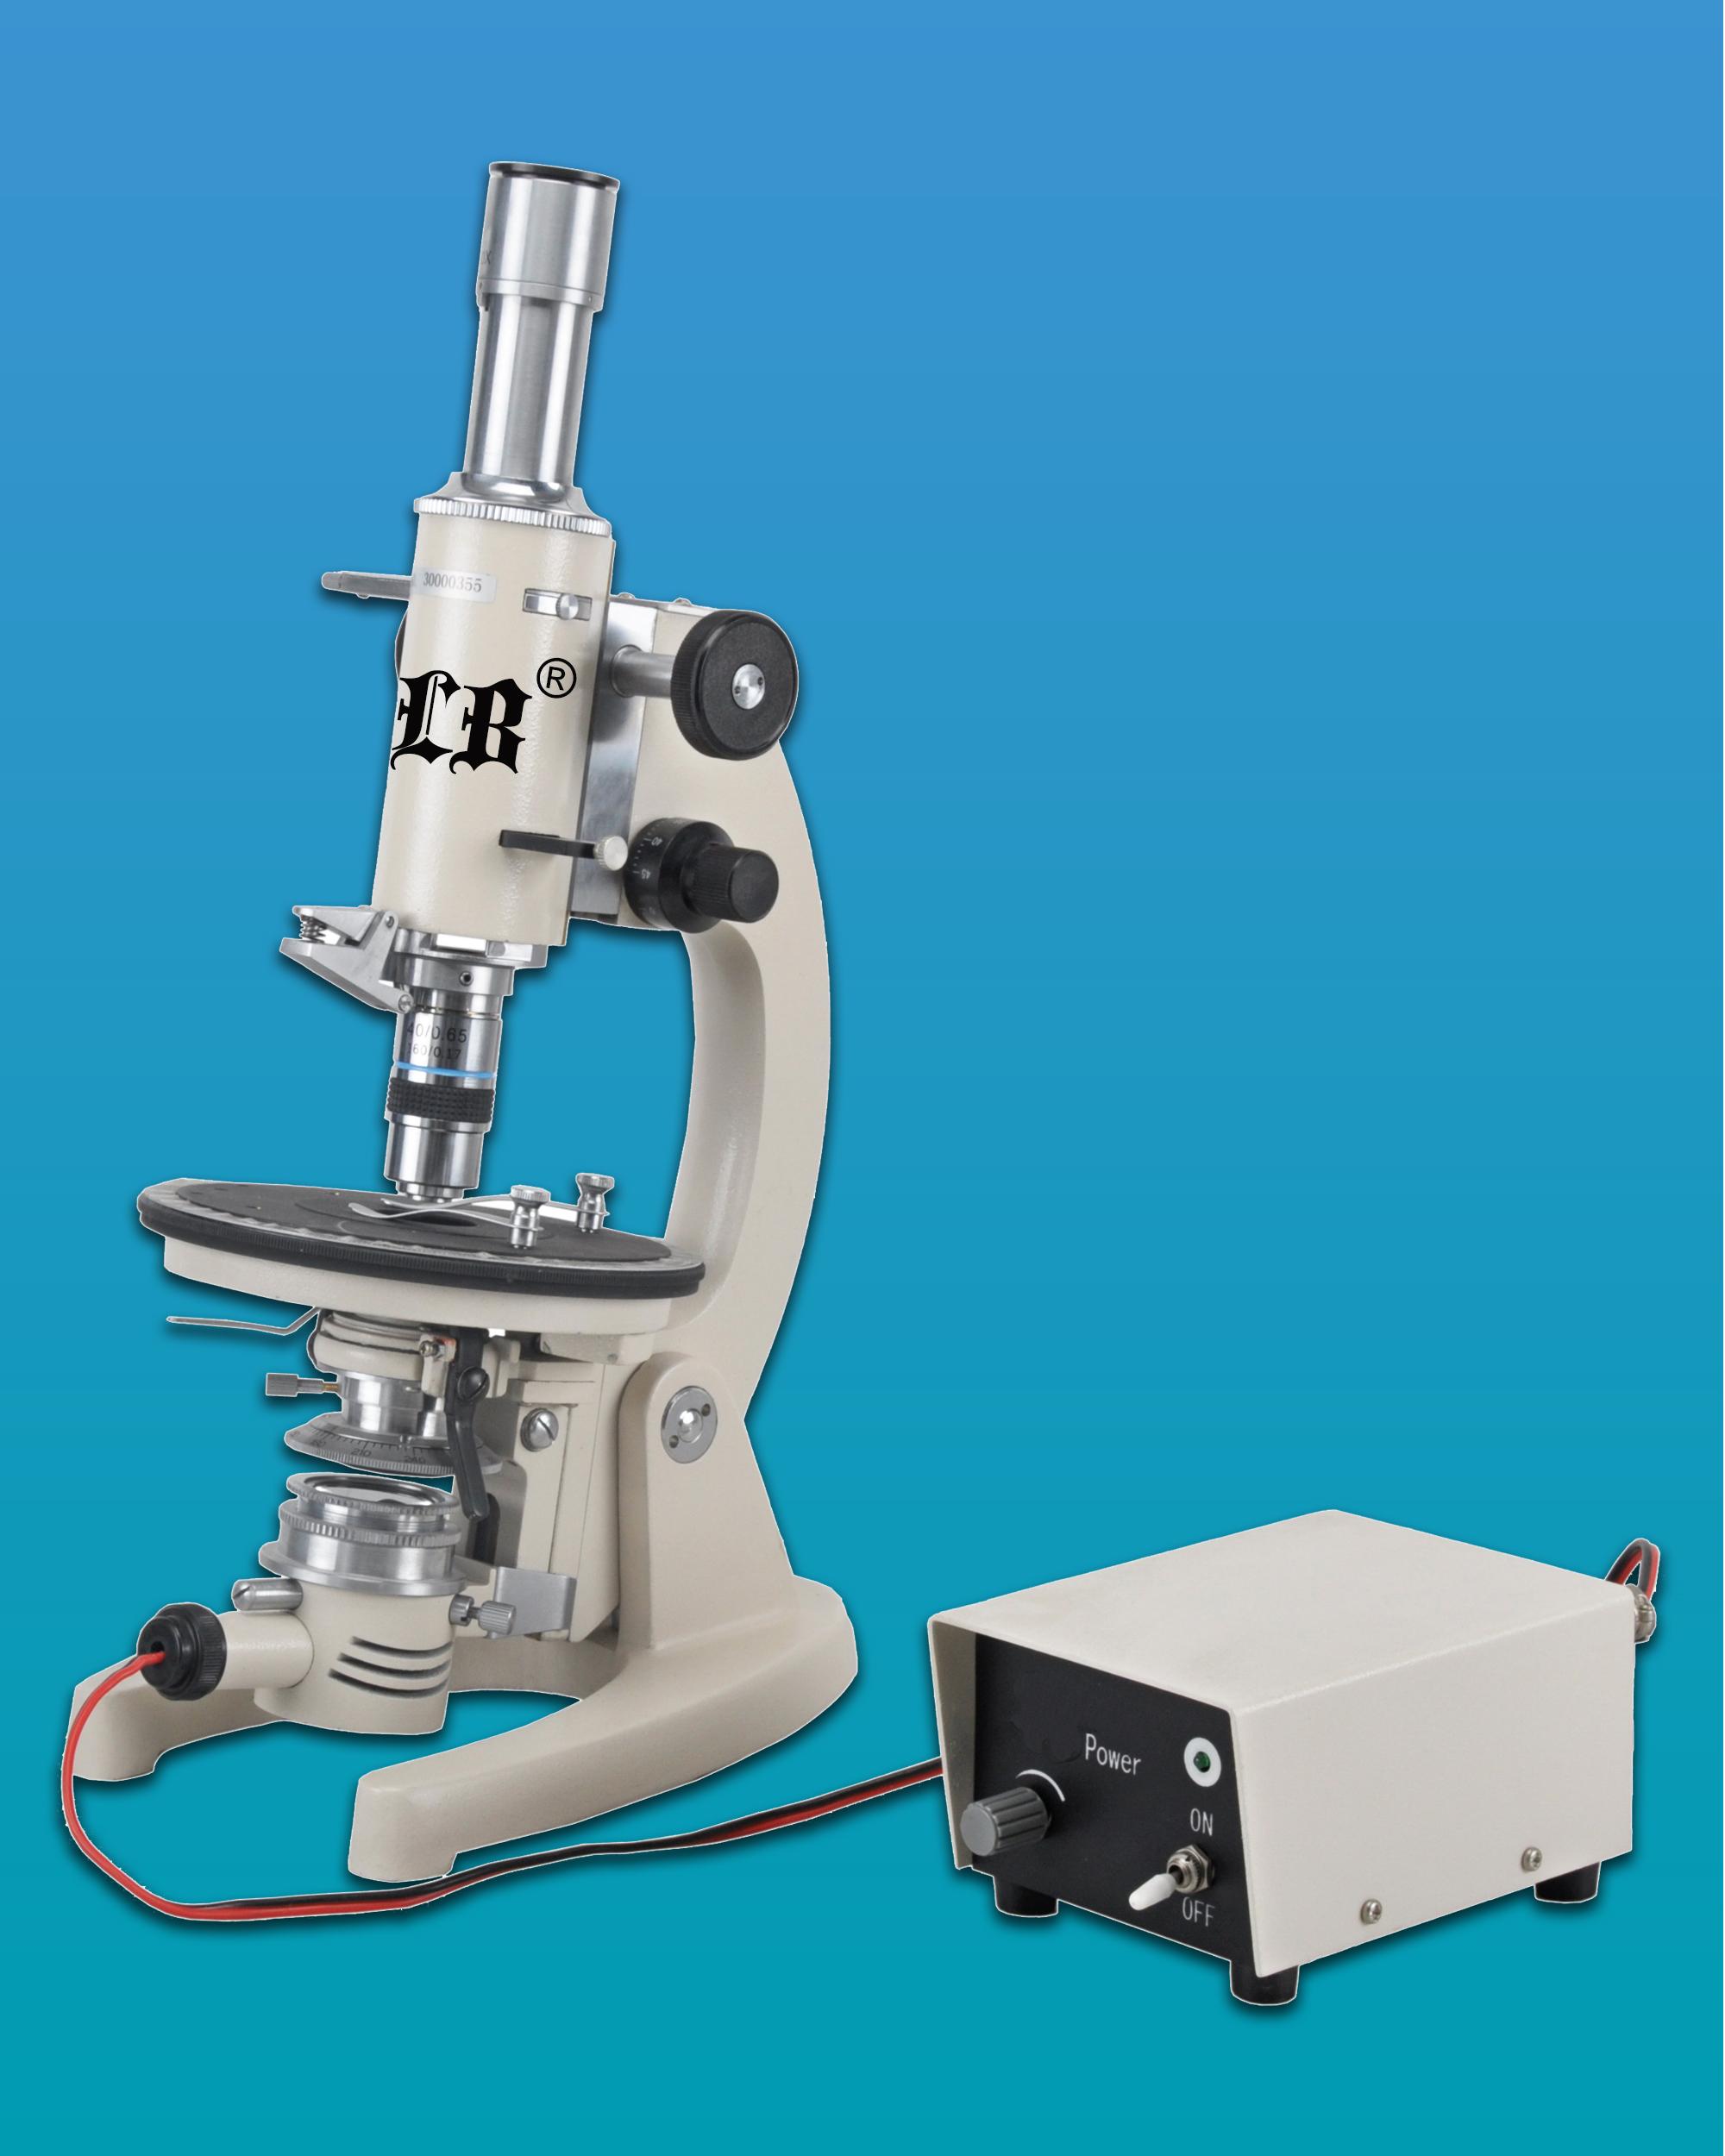 [LB-120] Polarizing Monocular Microscope